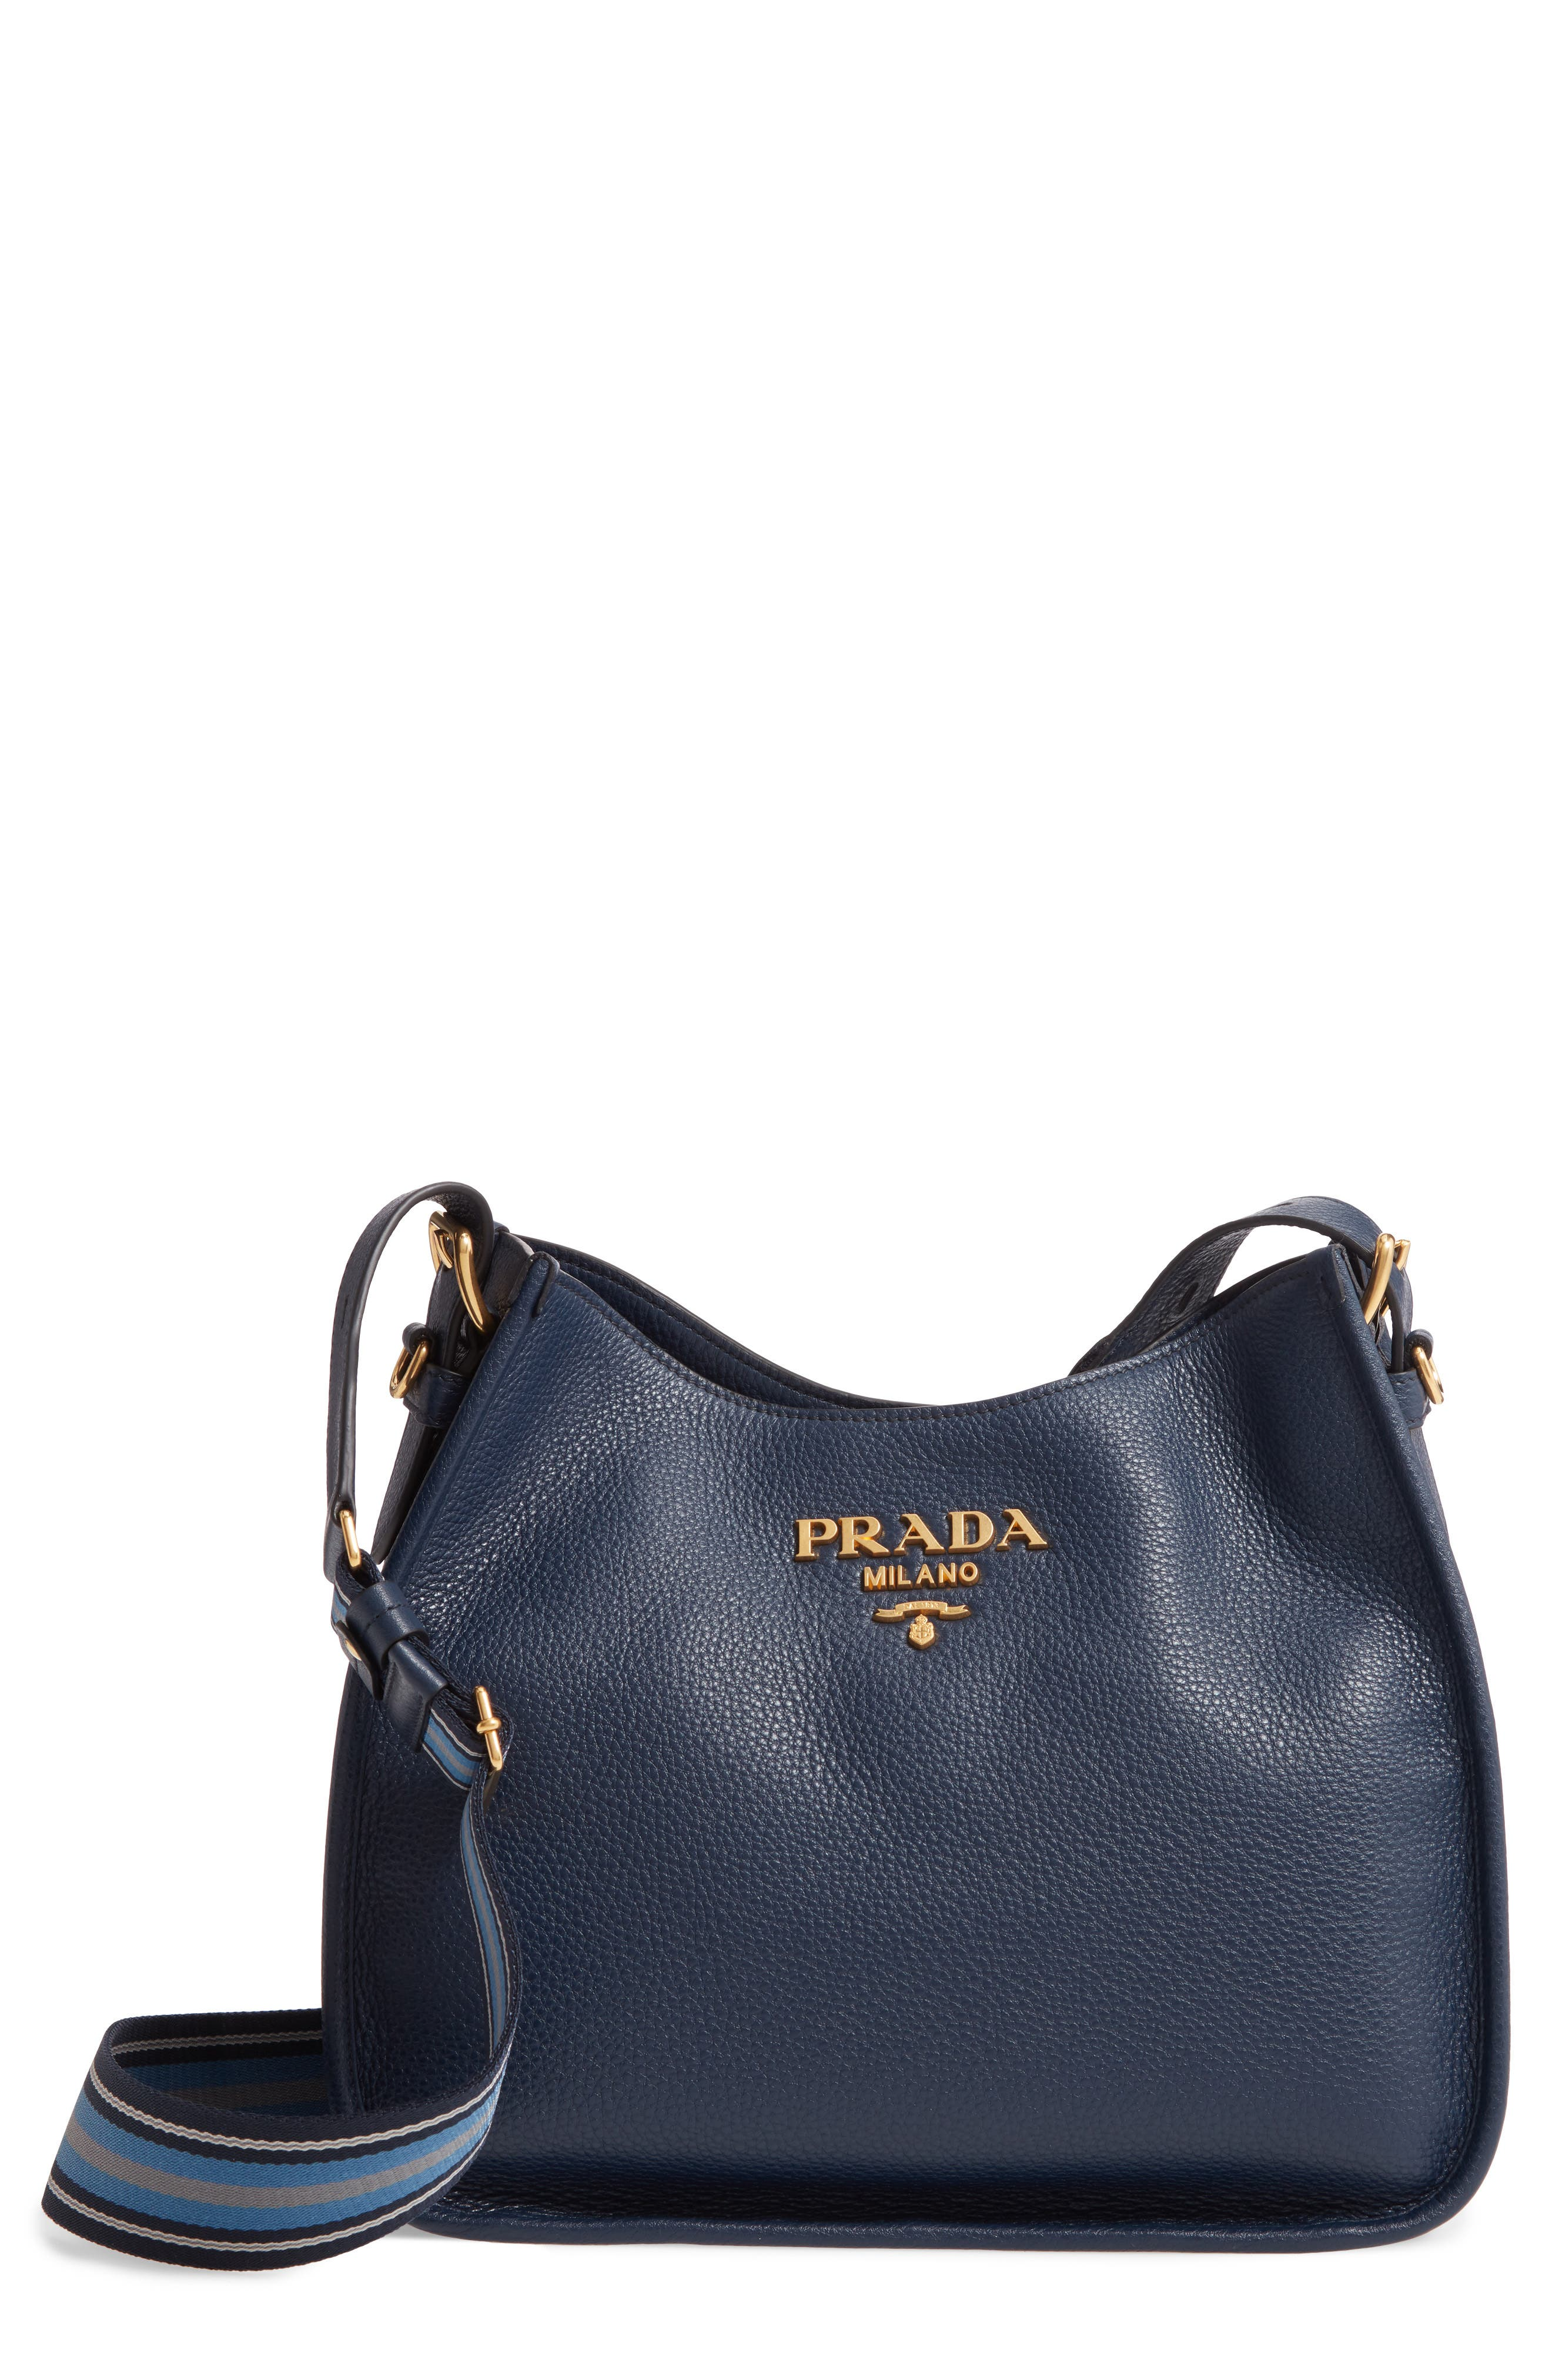 Prada Handbags, Purses & Wallets | Nordstrom